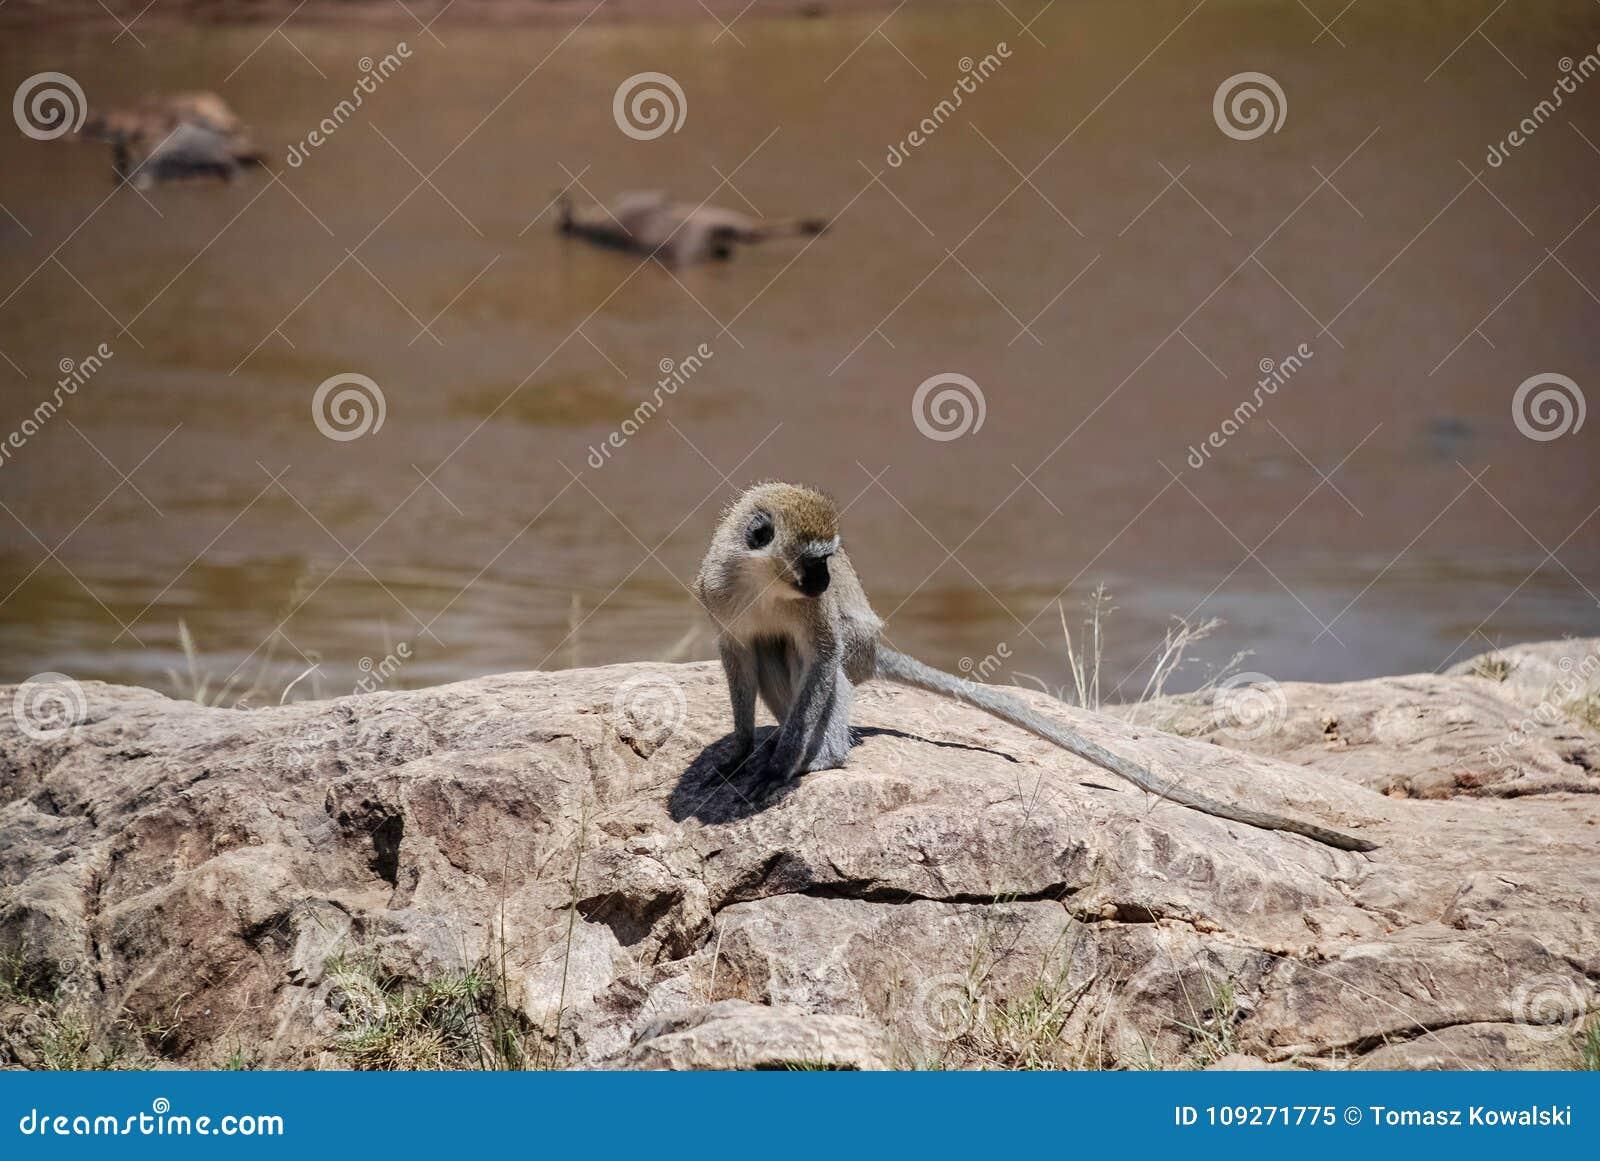 Scimmia di Vervet Maasai Mara National Reservek Kenya